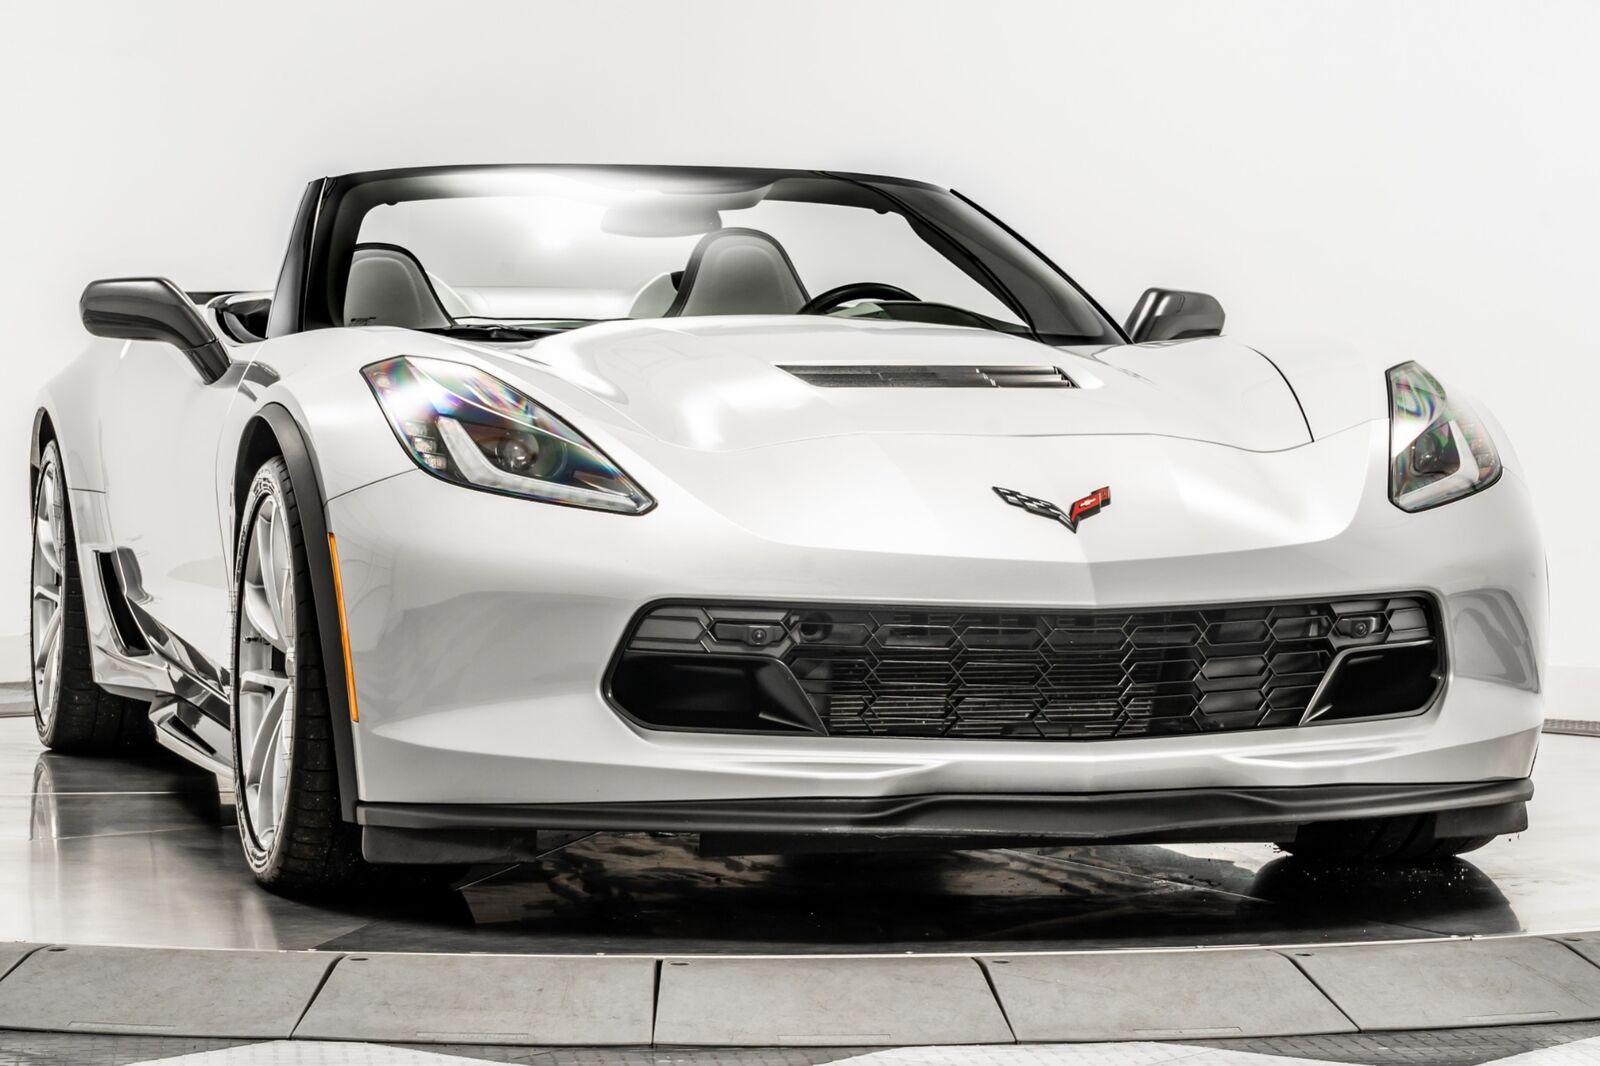 2019 Silver Chevrolet Corvette Grand Sport 2LT | C7 Corvette Photo 2